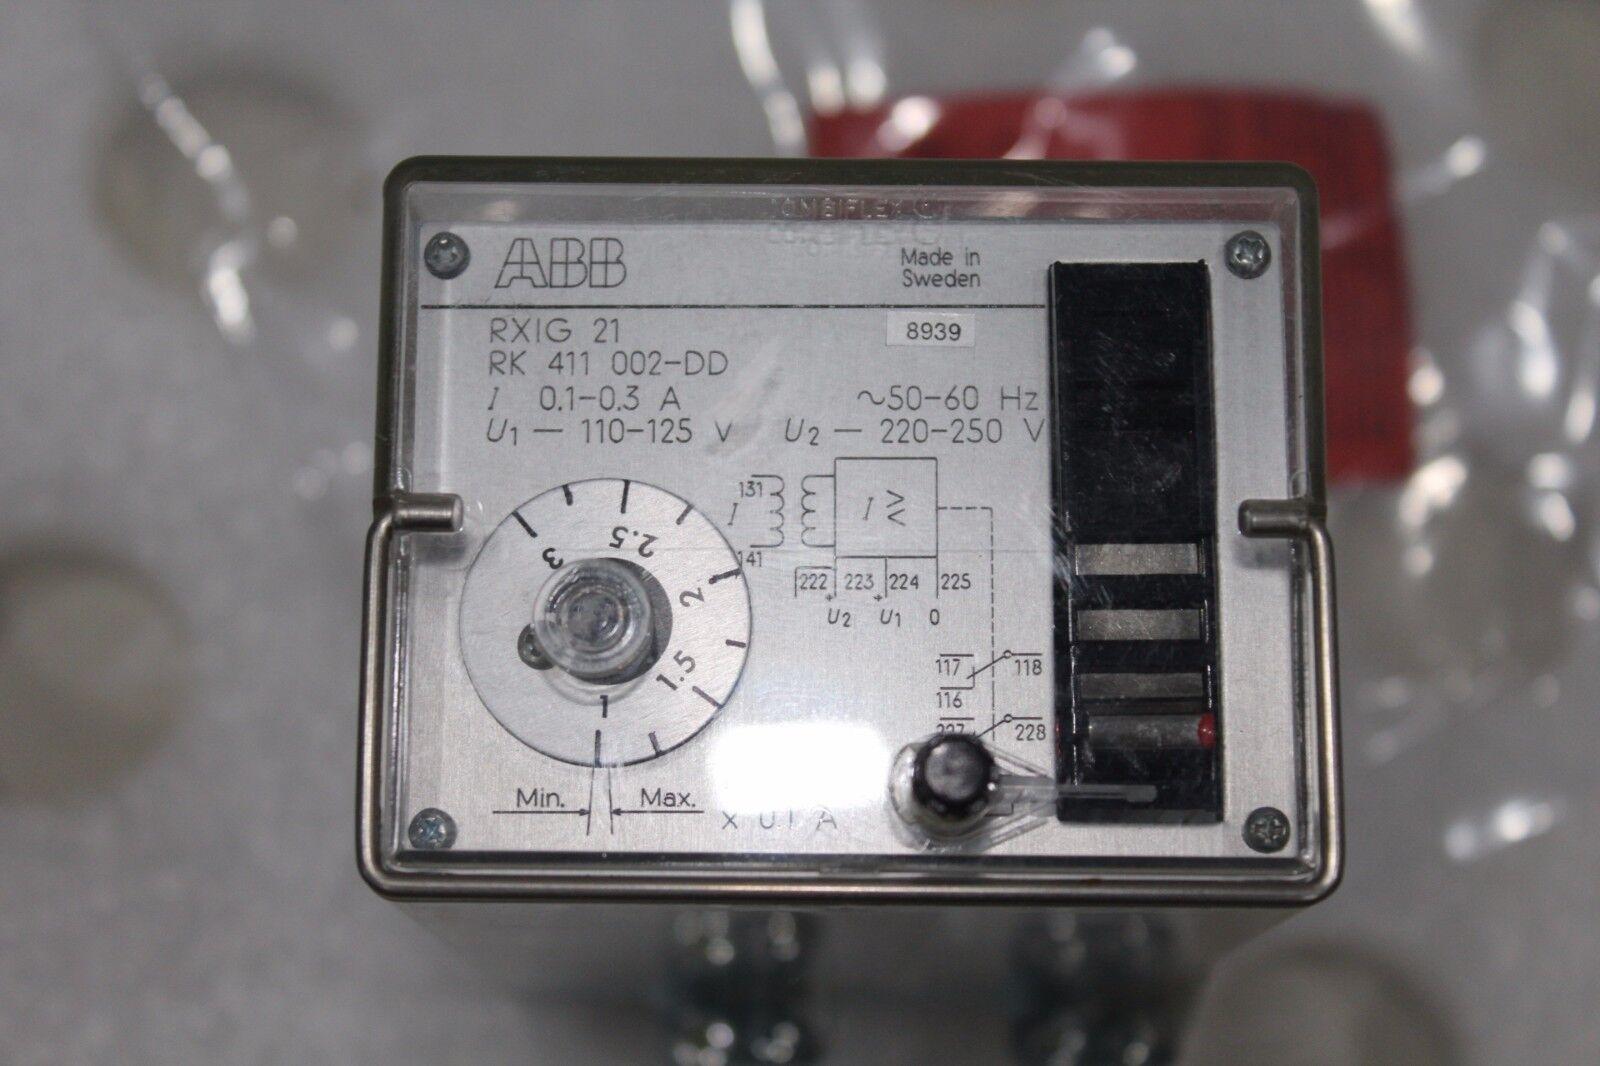 Abb Overcurrent Relay Rxig 21 Rk 411 002 Dk Ebay